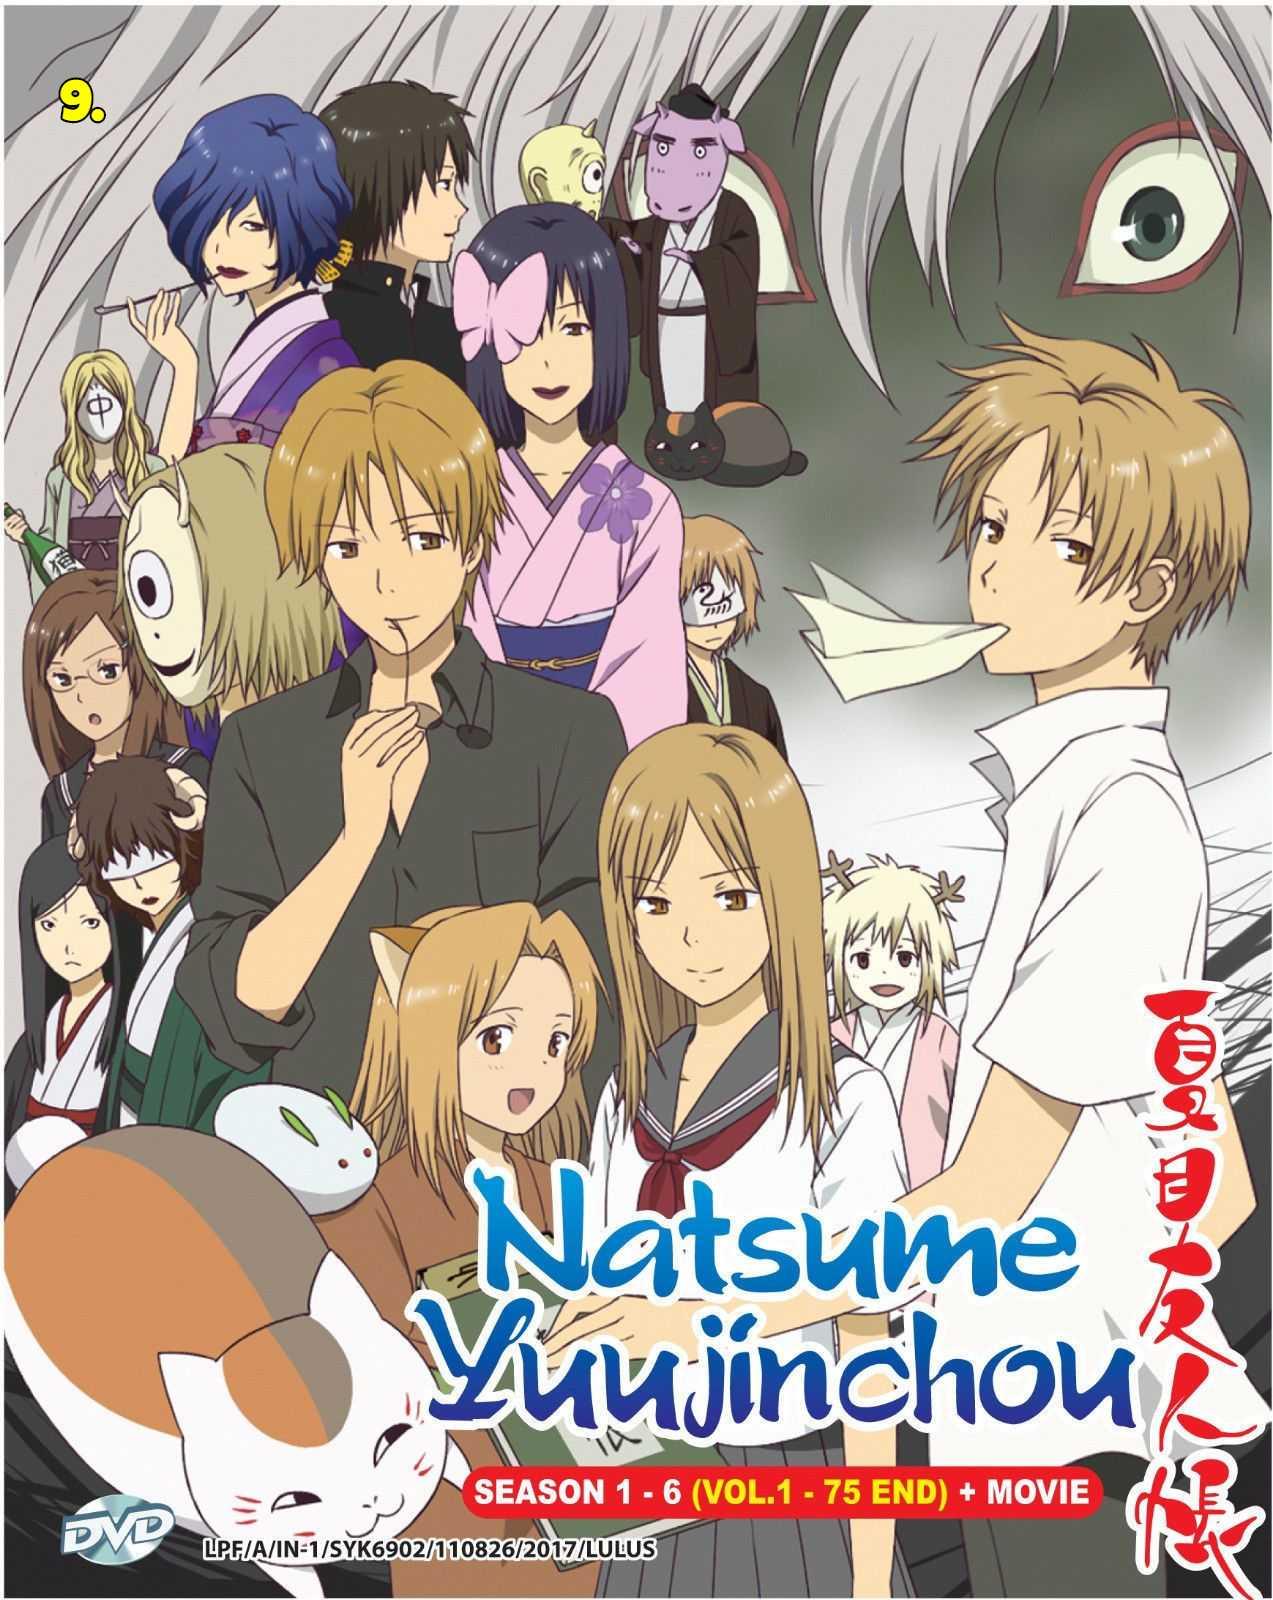 Natsume Yuujinchou (Natsume's Book of Friends)